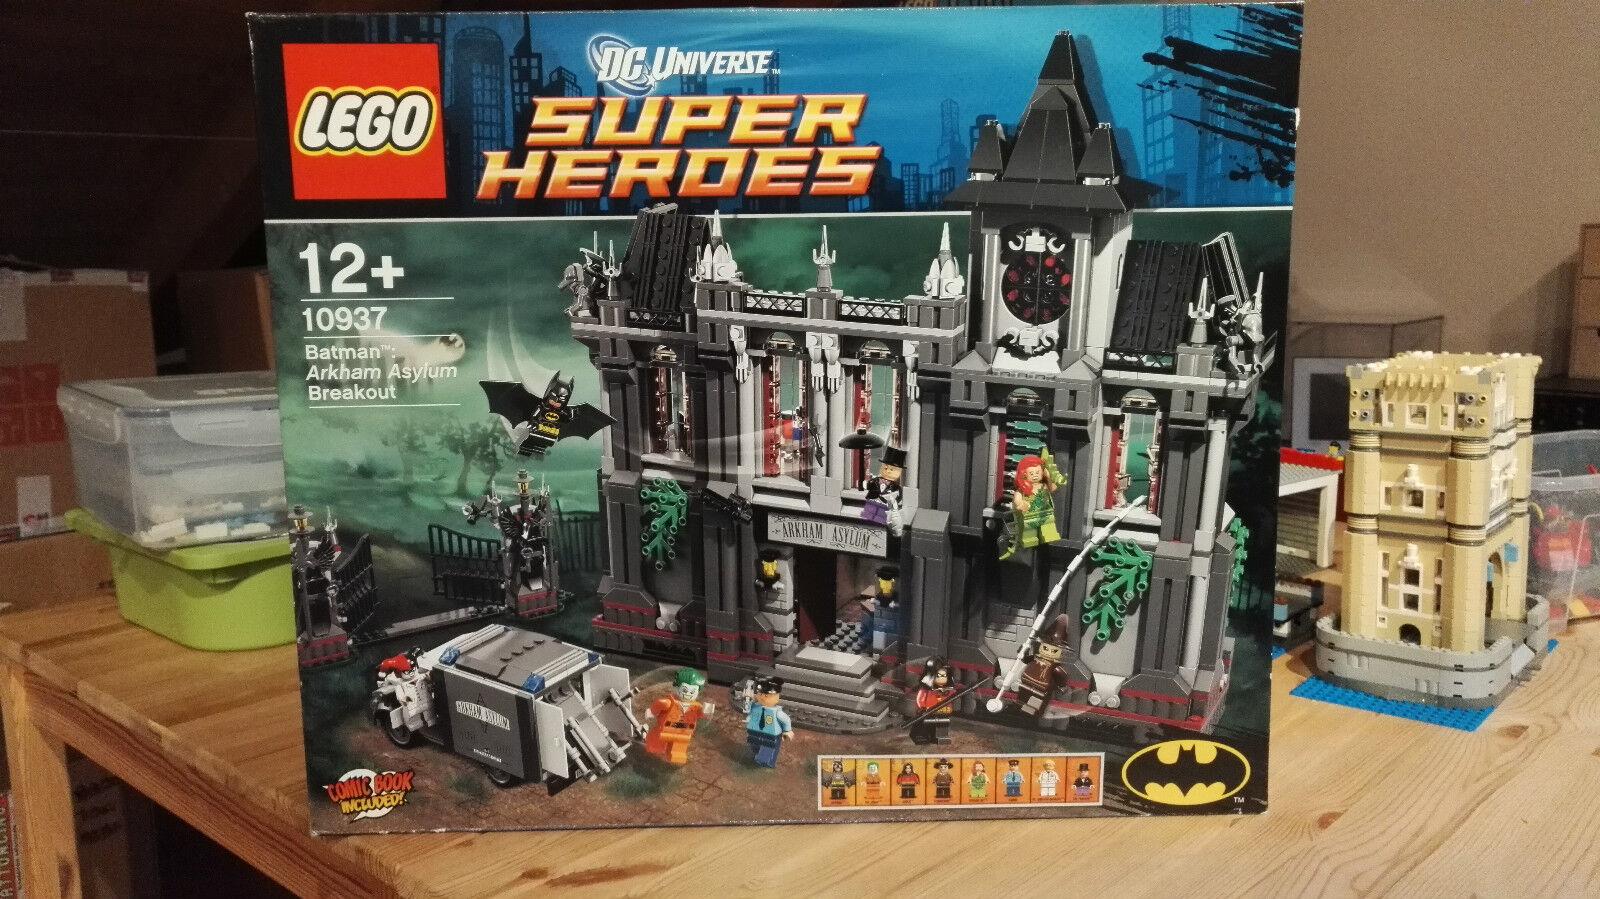 LEGO 10937 ARKHAM ASYLUM BREAKOUT-SUPERHEROES-batman-DC UNIVERSE-nuovo